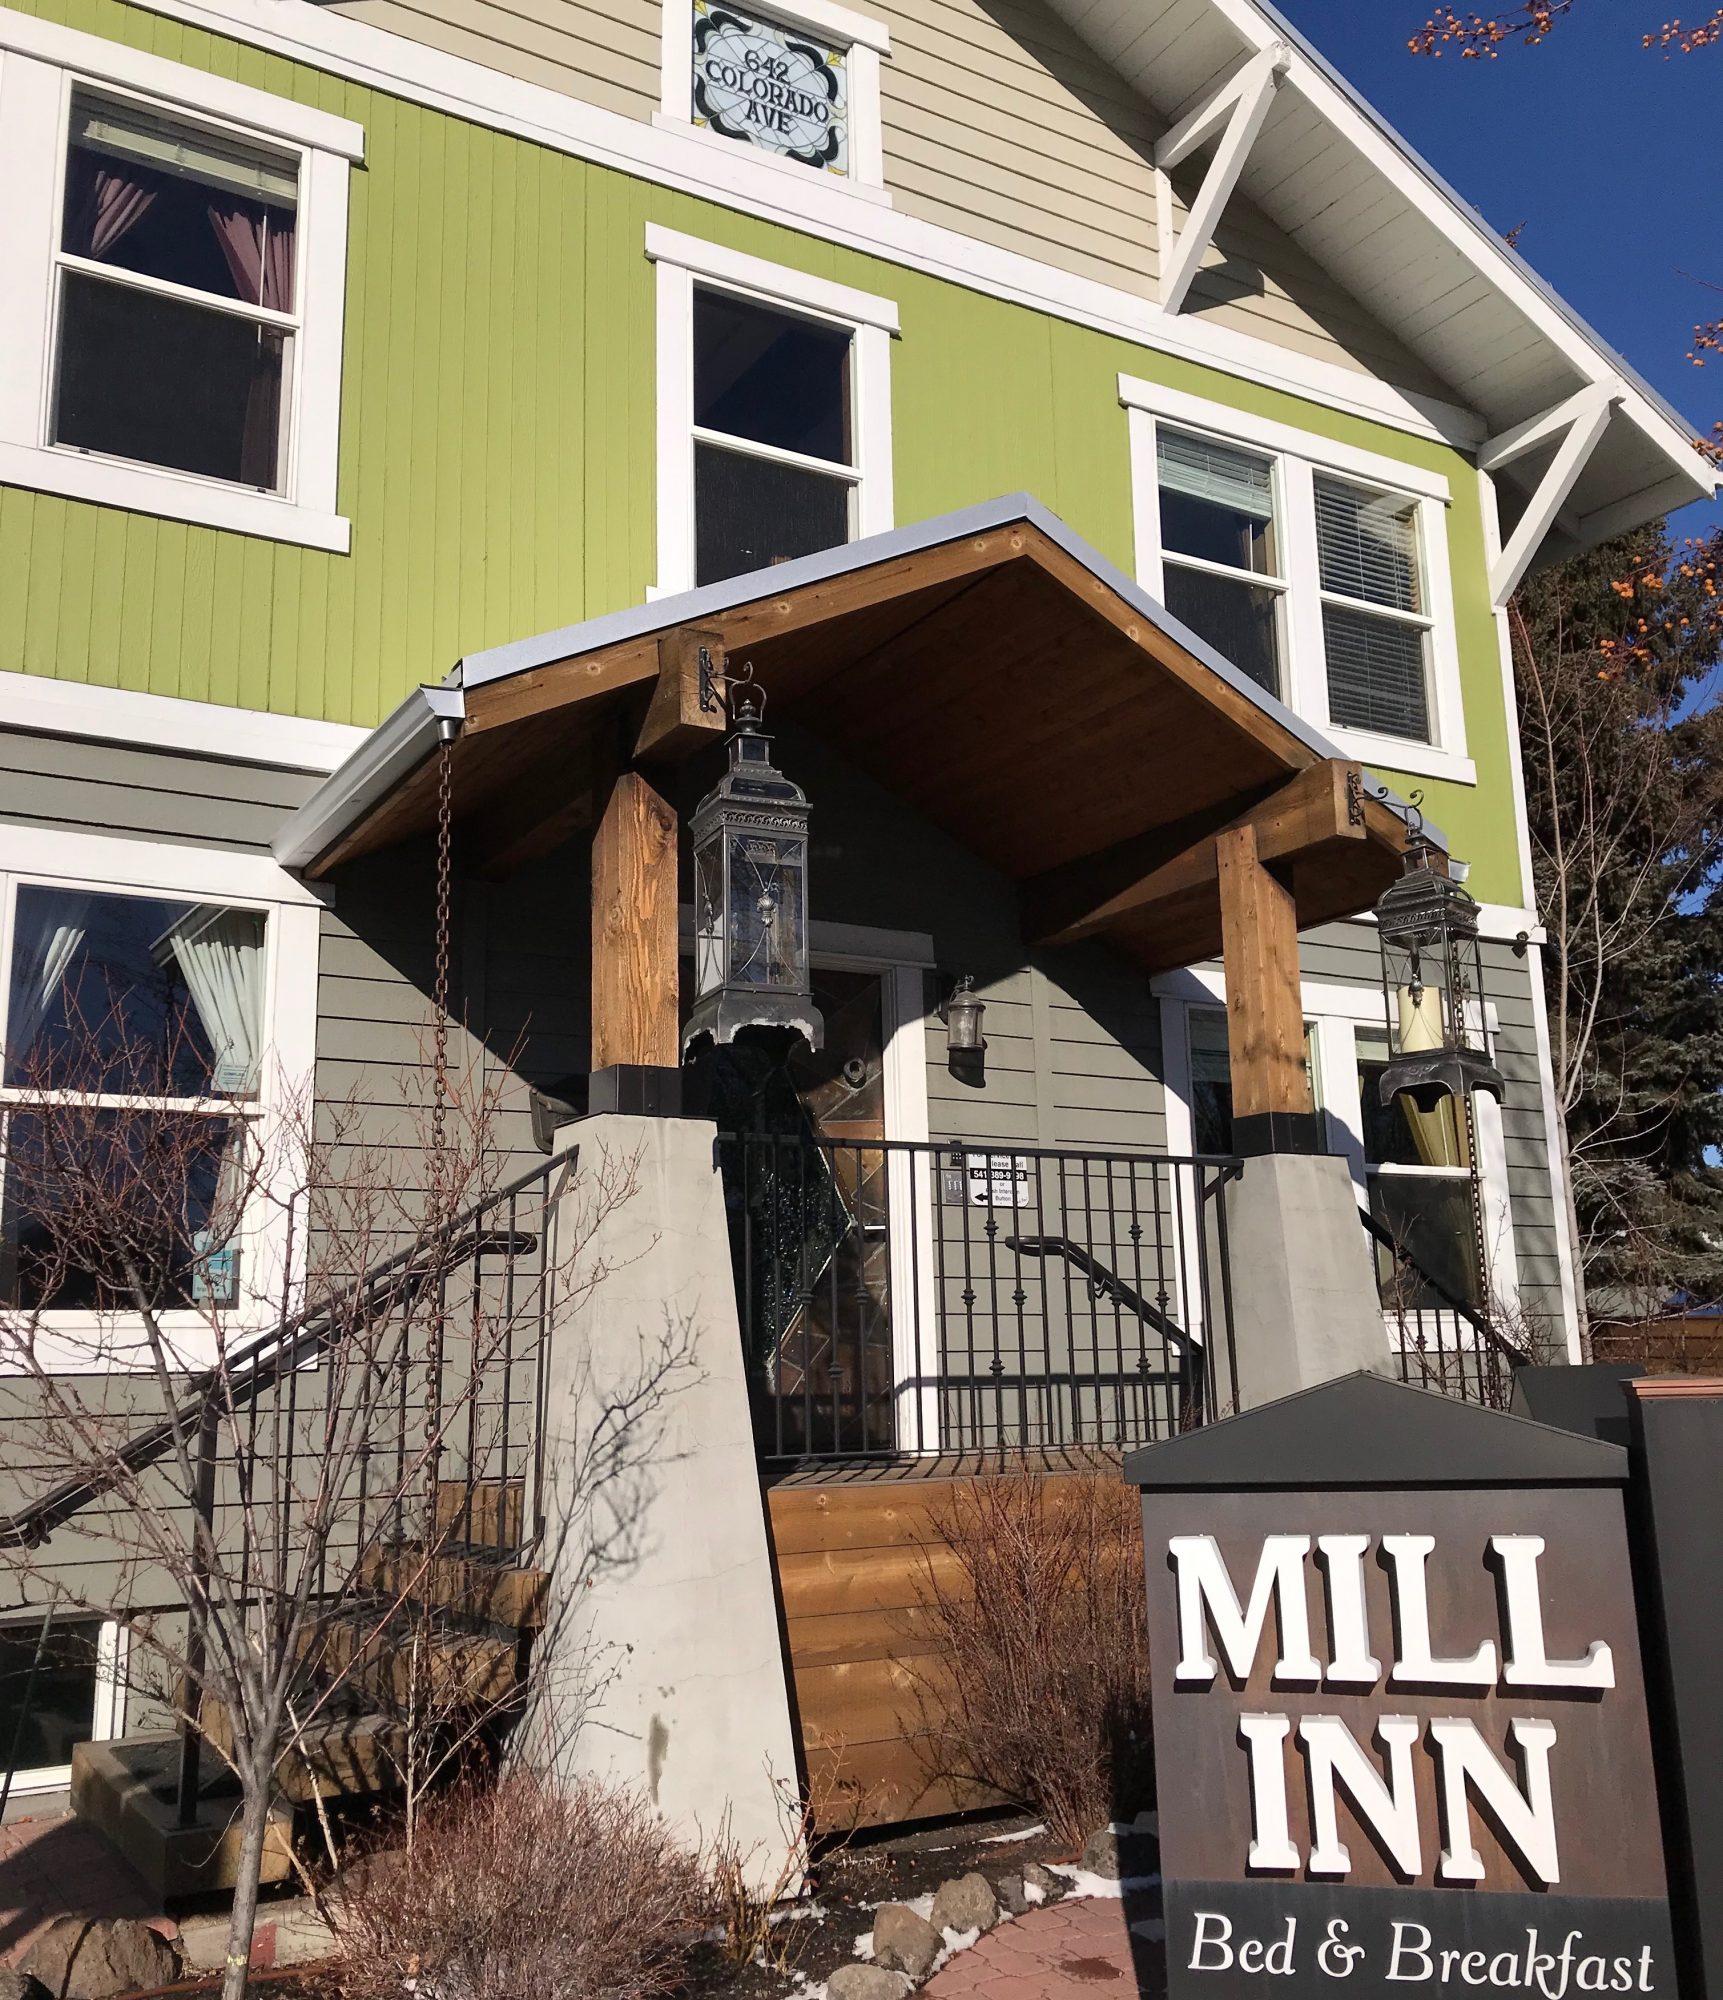 Mill Inn B&B in Bend, OR